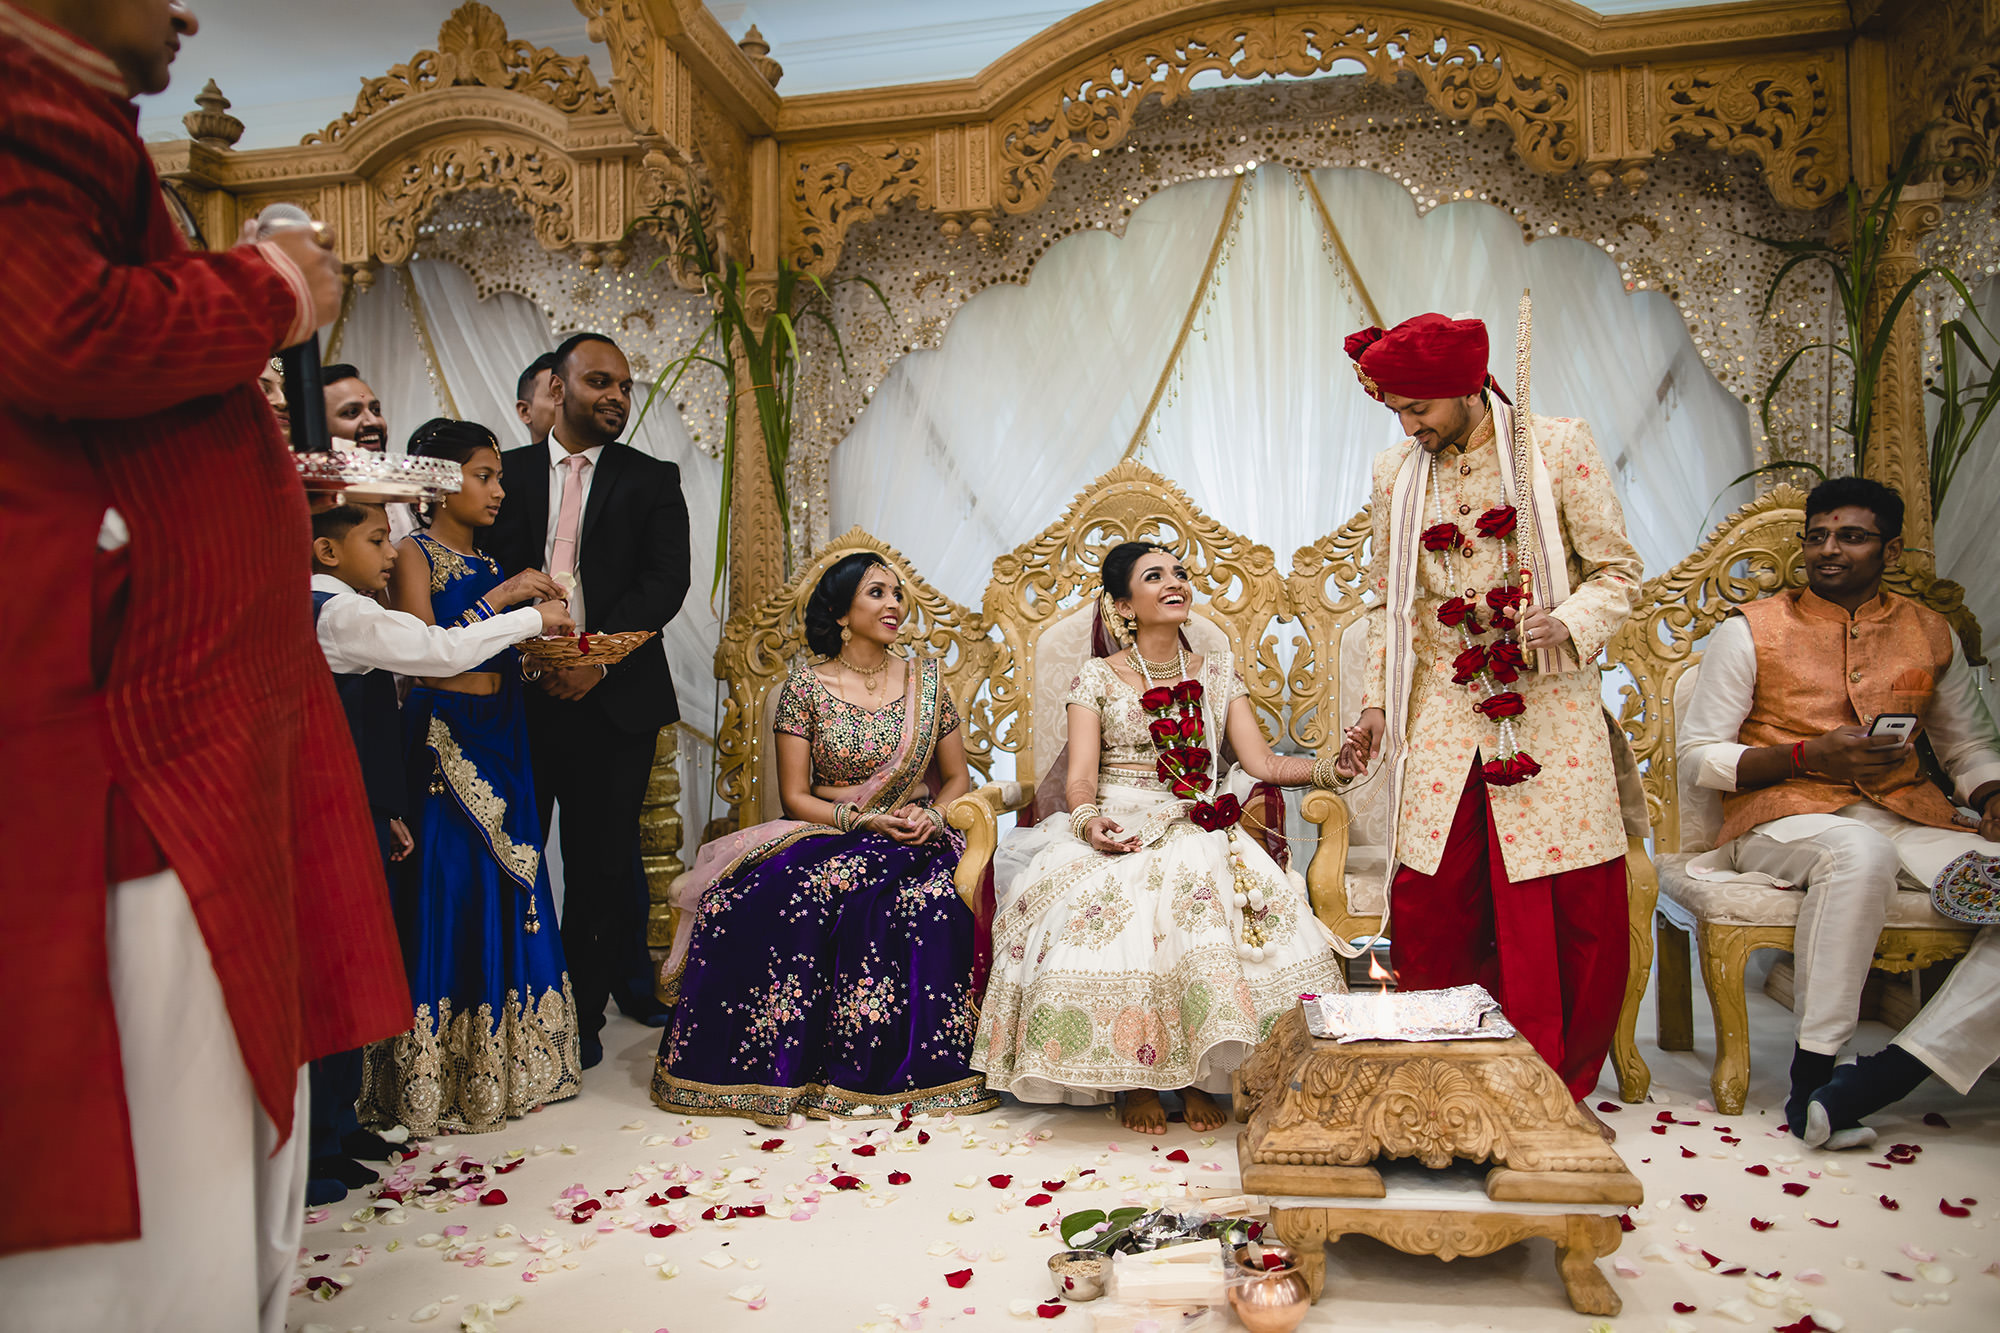 hindu wedding bride and groom games